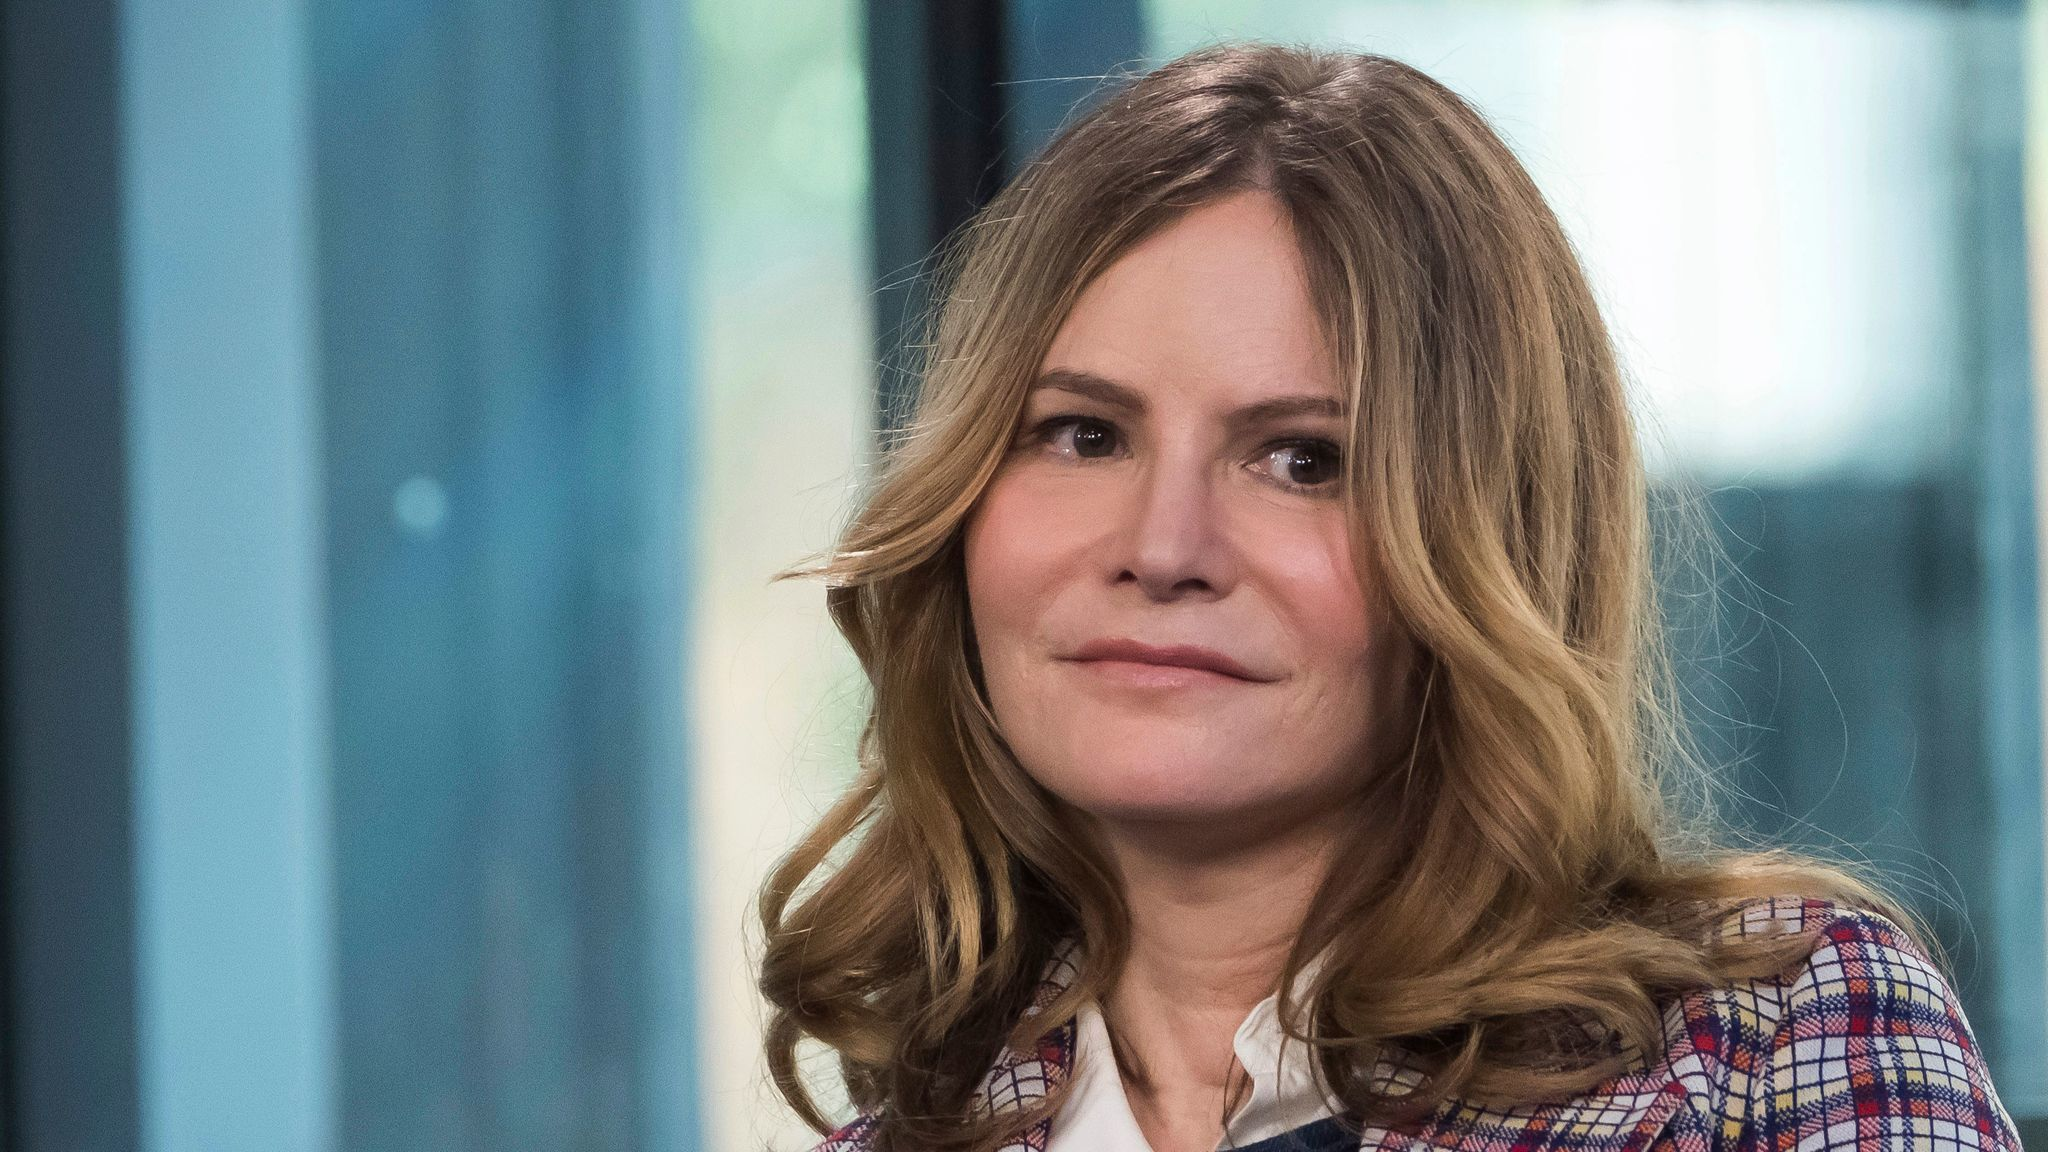 Ewen Bremner (born 1972),Ruth Sheen (born 1952) Hot clip Eda Nolan (b. 1988),Victoria Nicholls